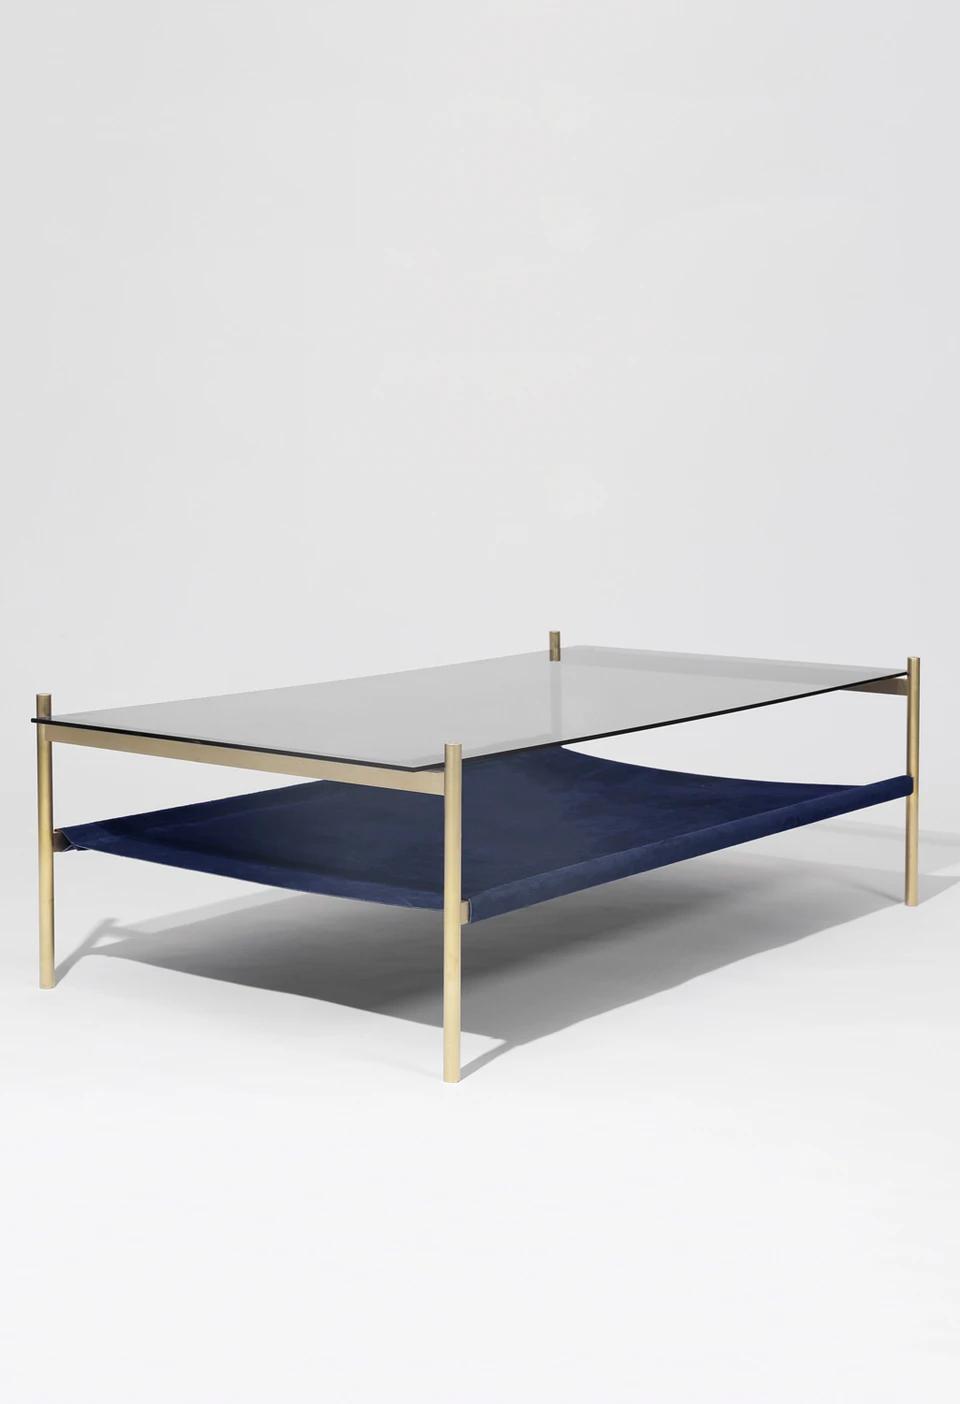 Duotone Rectangular Coffee Table Brass Frame Smoked Glass Navy S Yield Brass Coffee Table Rectangular Coffee Table Coffee Table [ 1404 x 960 Pixel ]